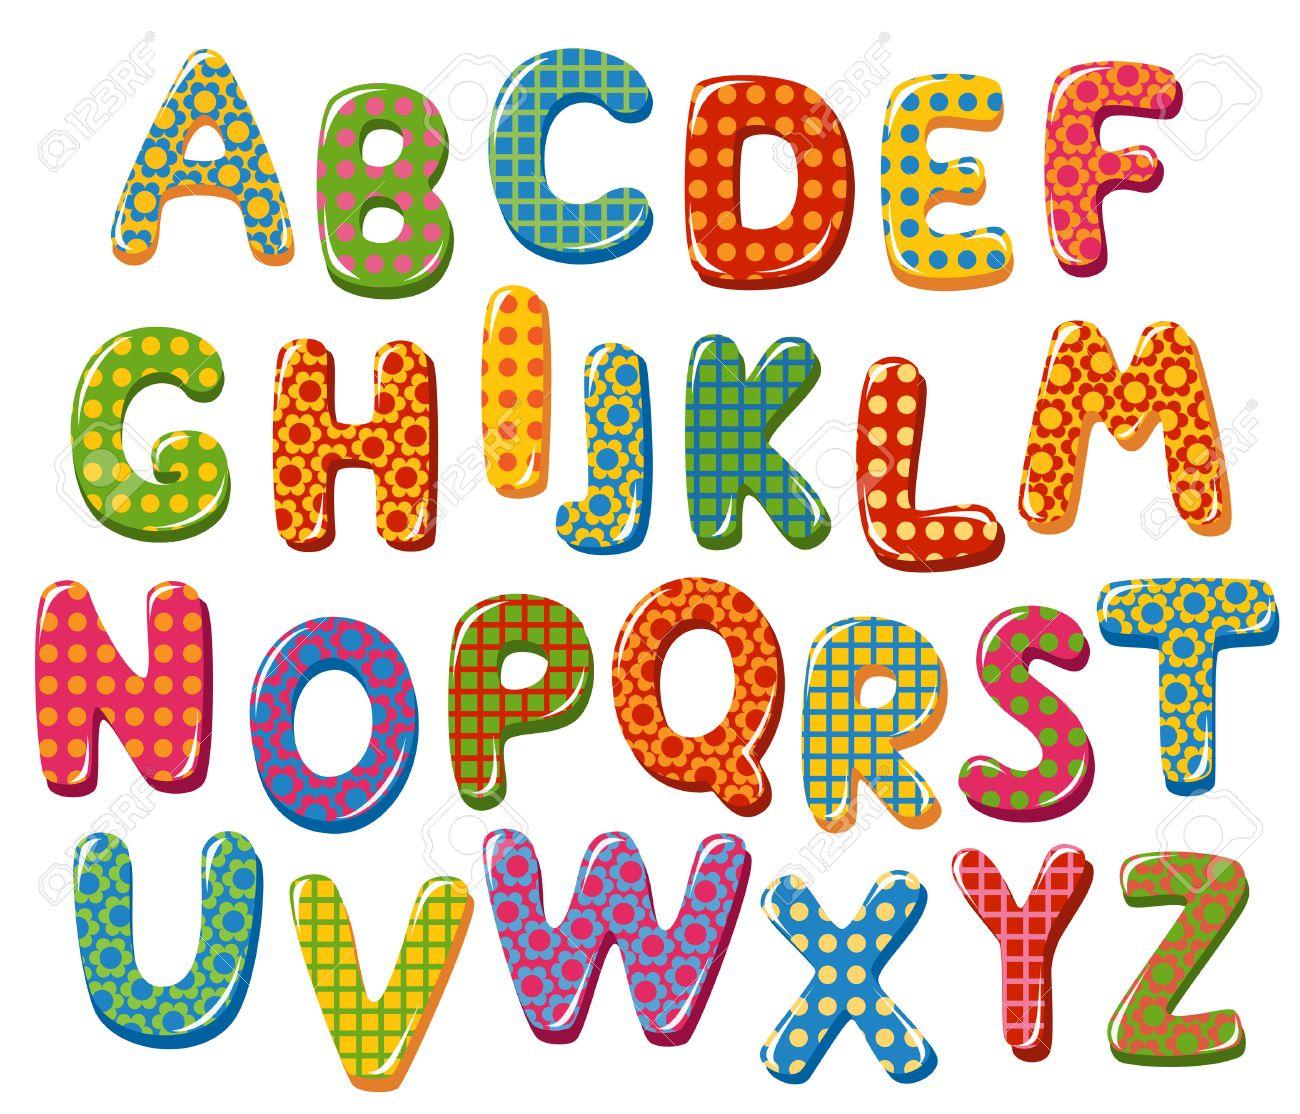 Image result for alphabet